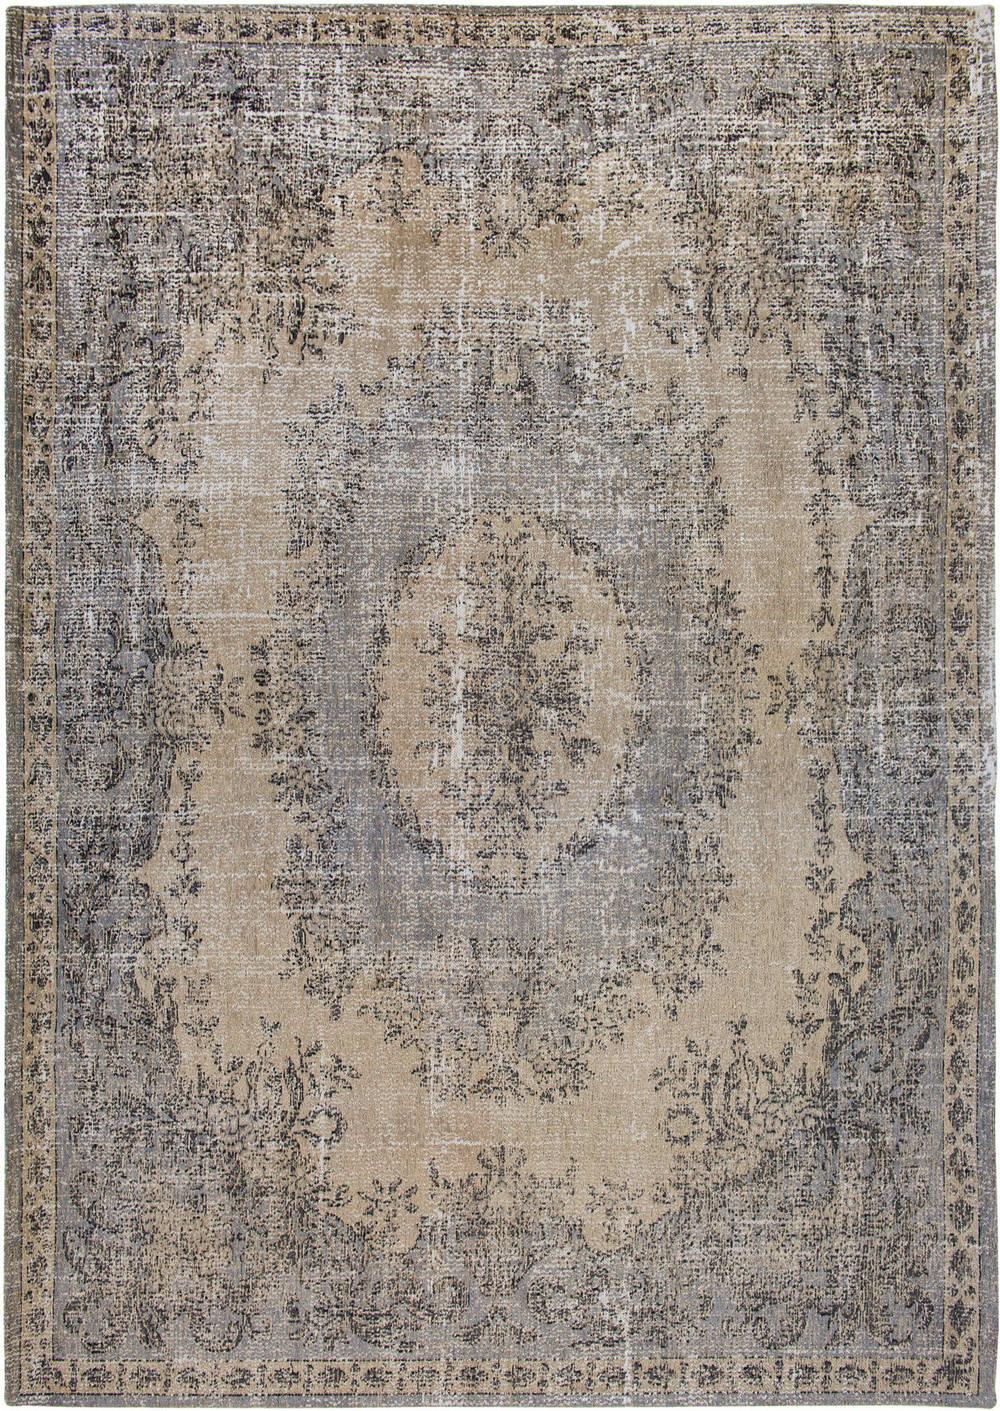 Vloerkleed Louis de Poortere Palazzo Colonna Taupe 9138